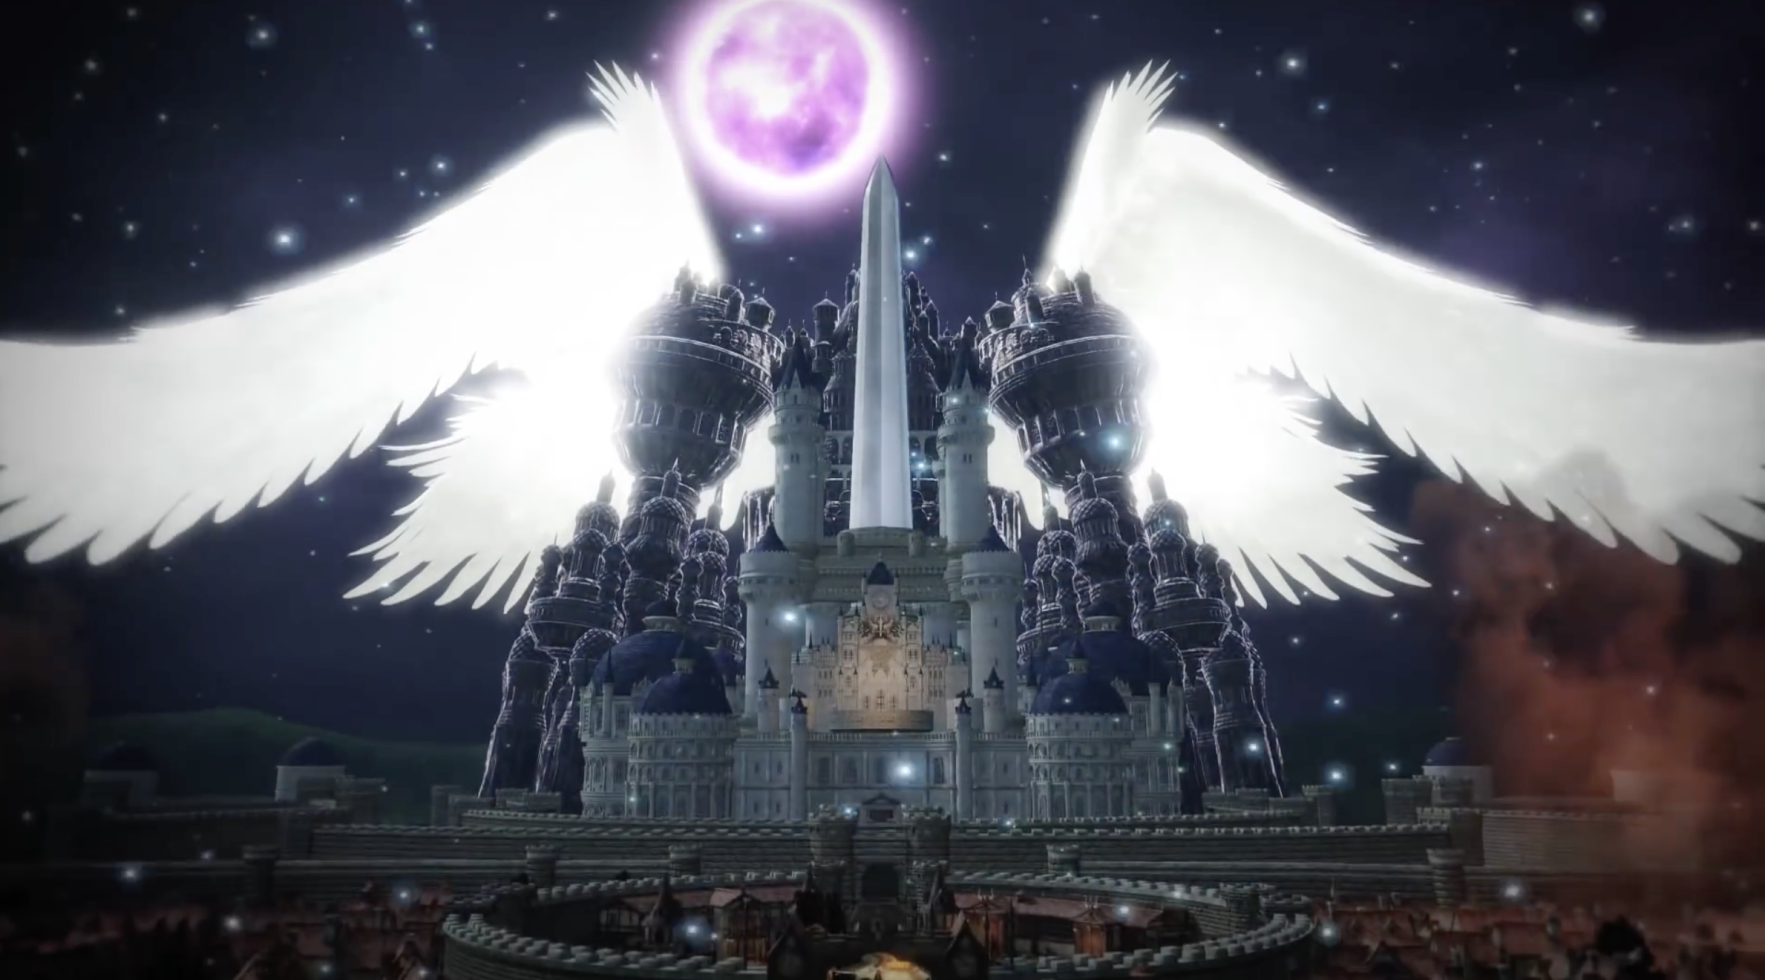 59 best images about Final Fantasy X Artwork on Pinterest